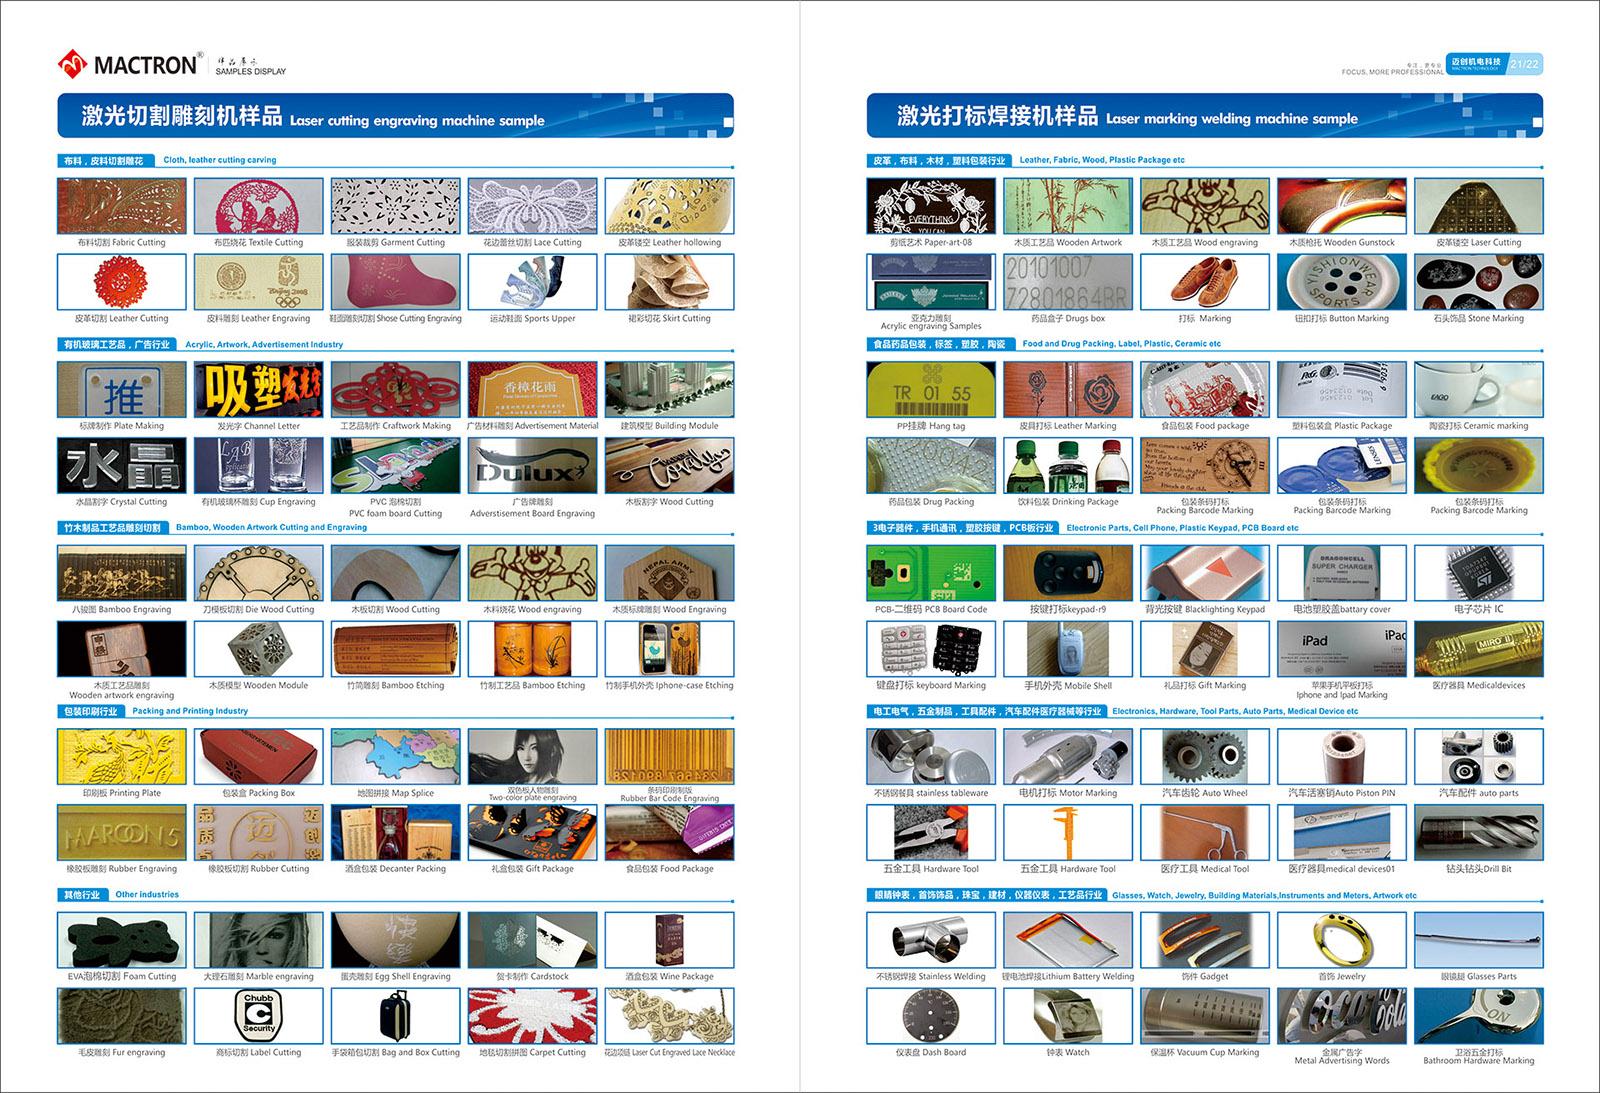 Mactron Tech Laser Catalogue 2017 (12)